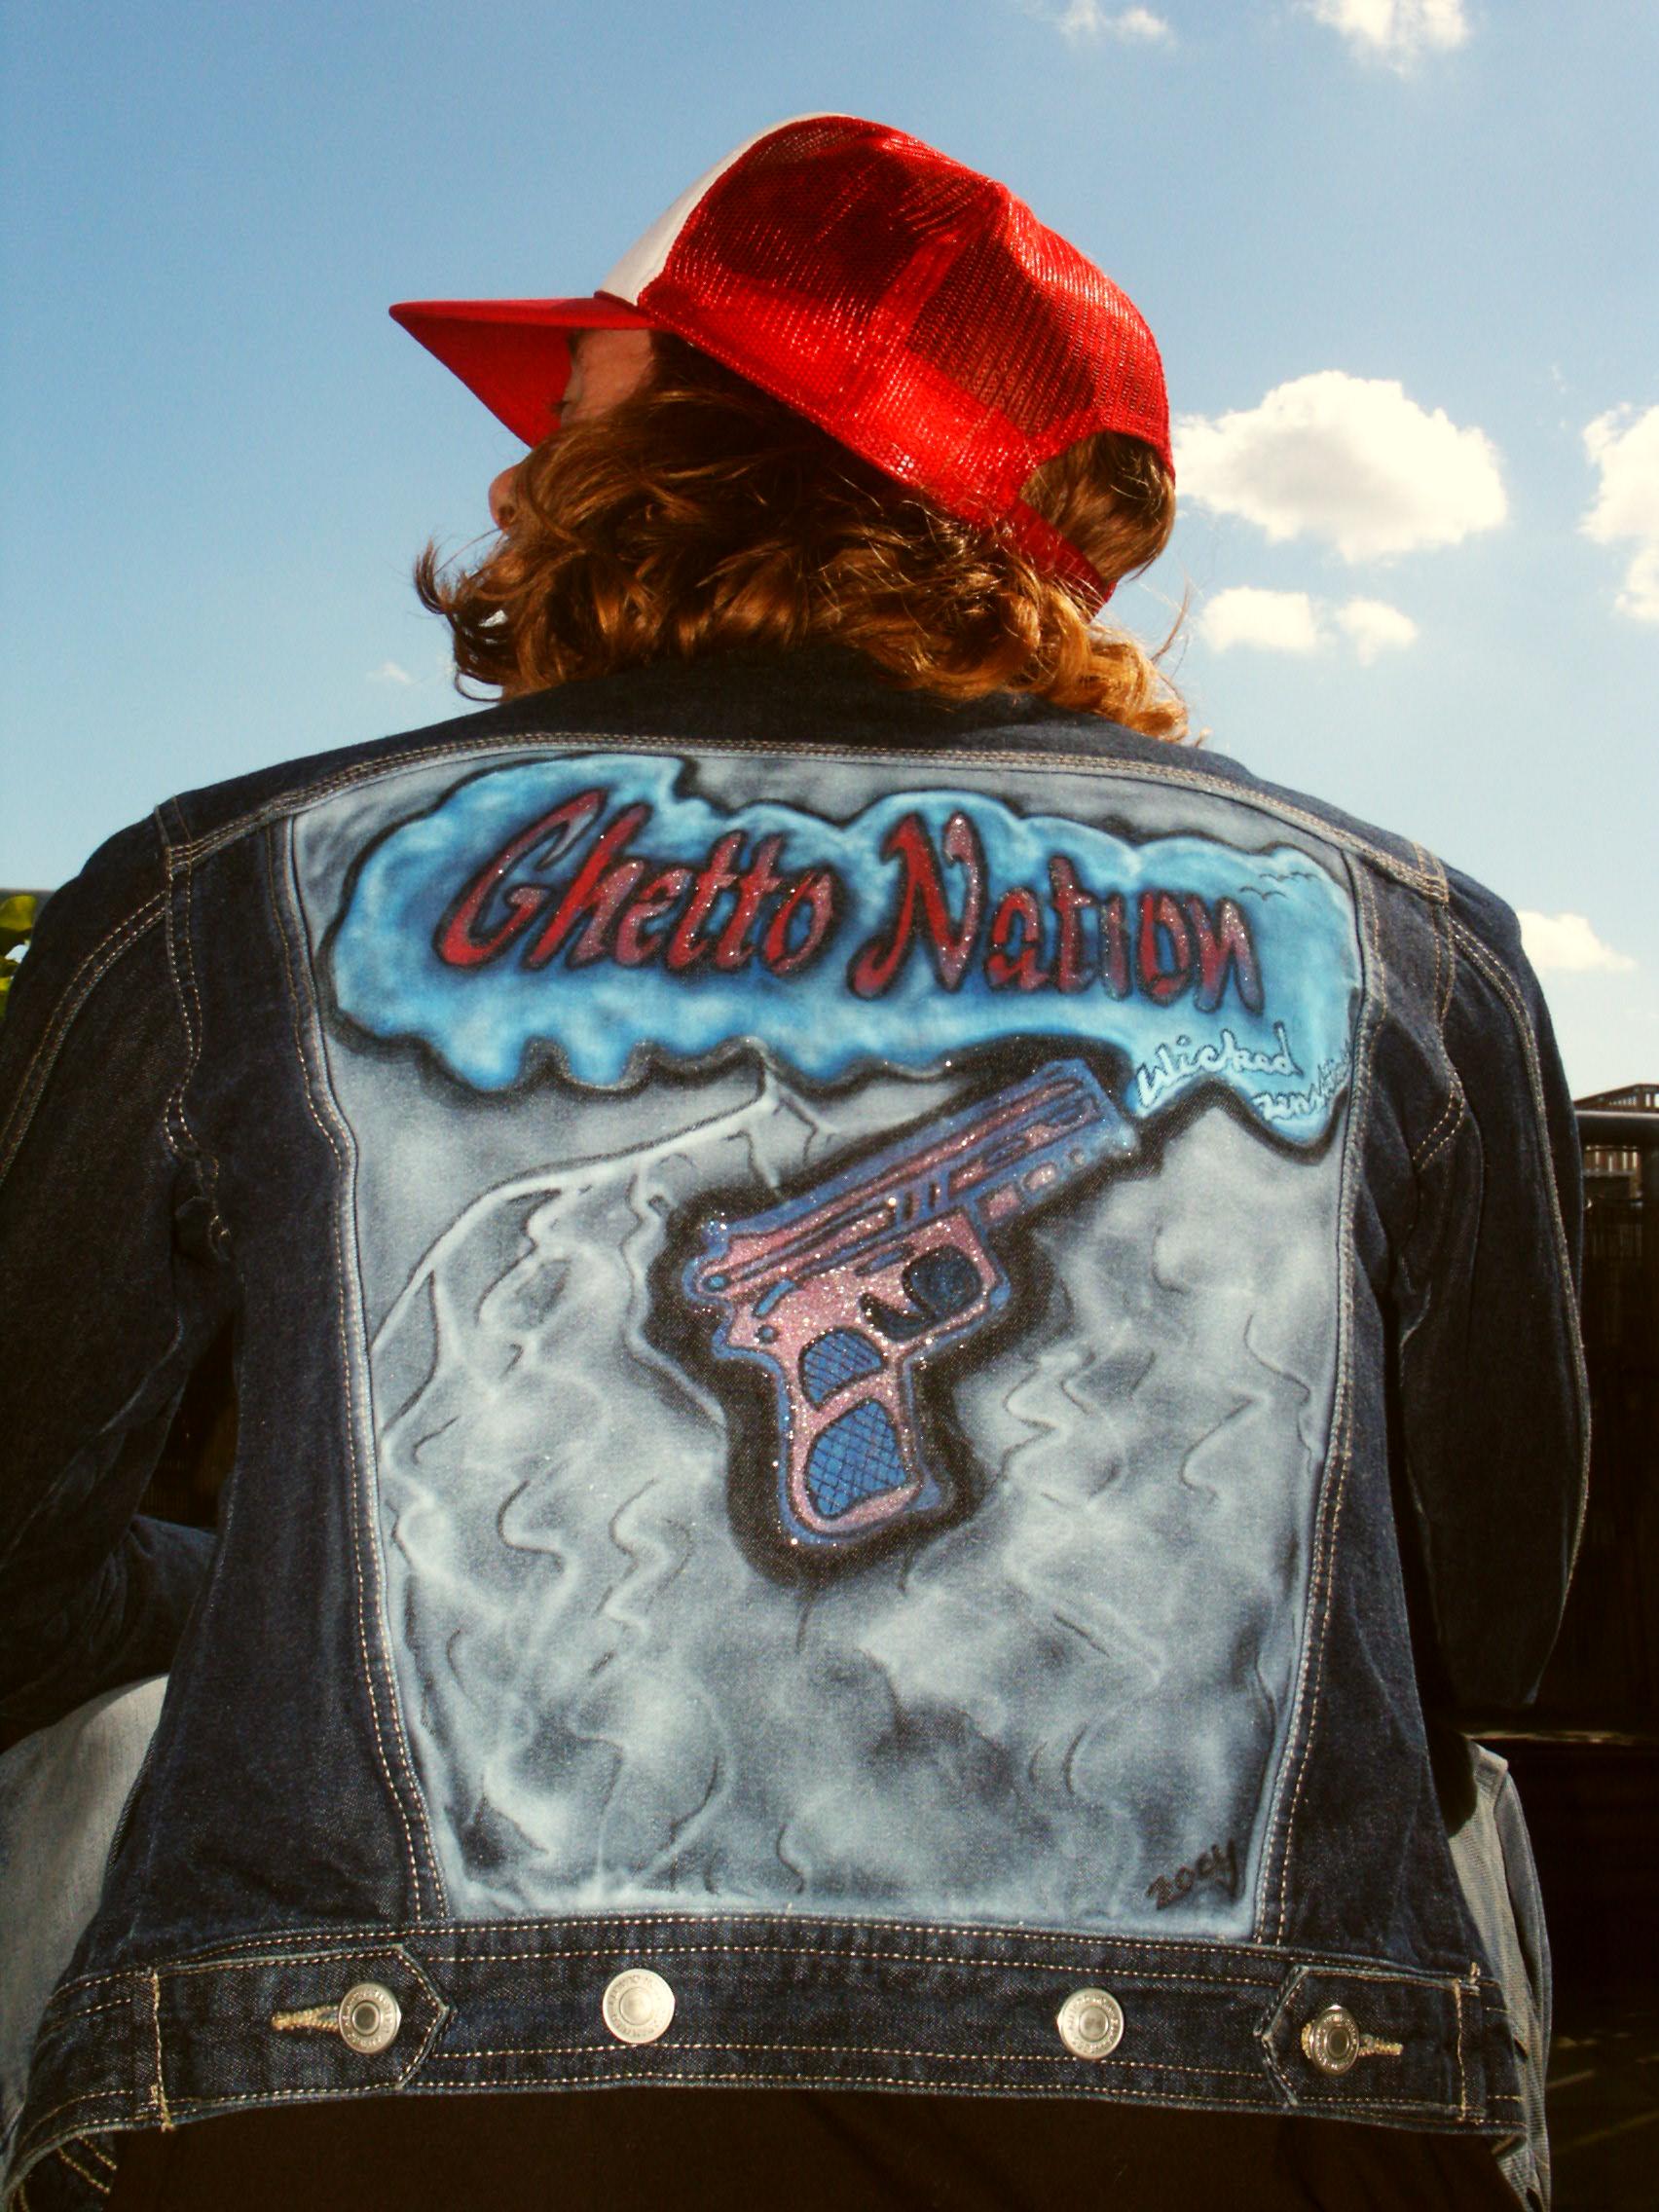 Airbrushed jacket Ghetto Nation